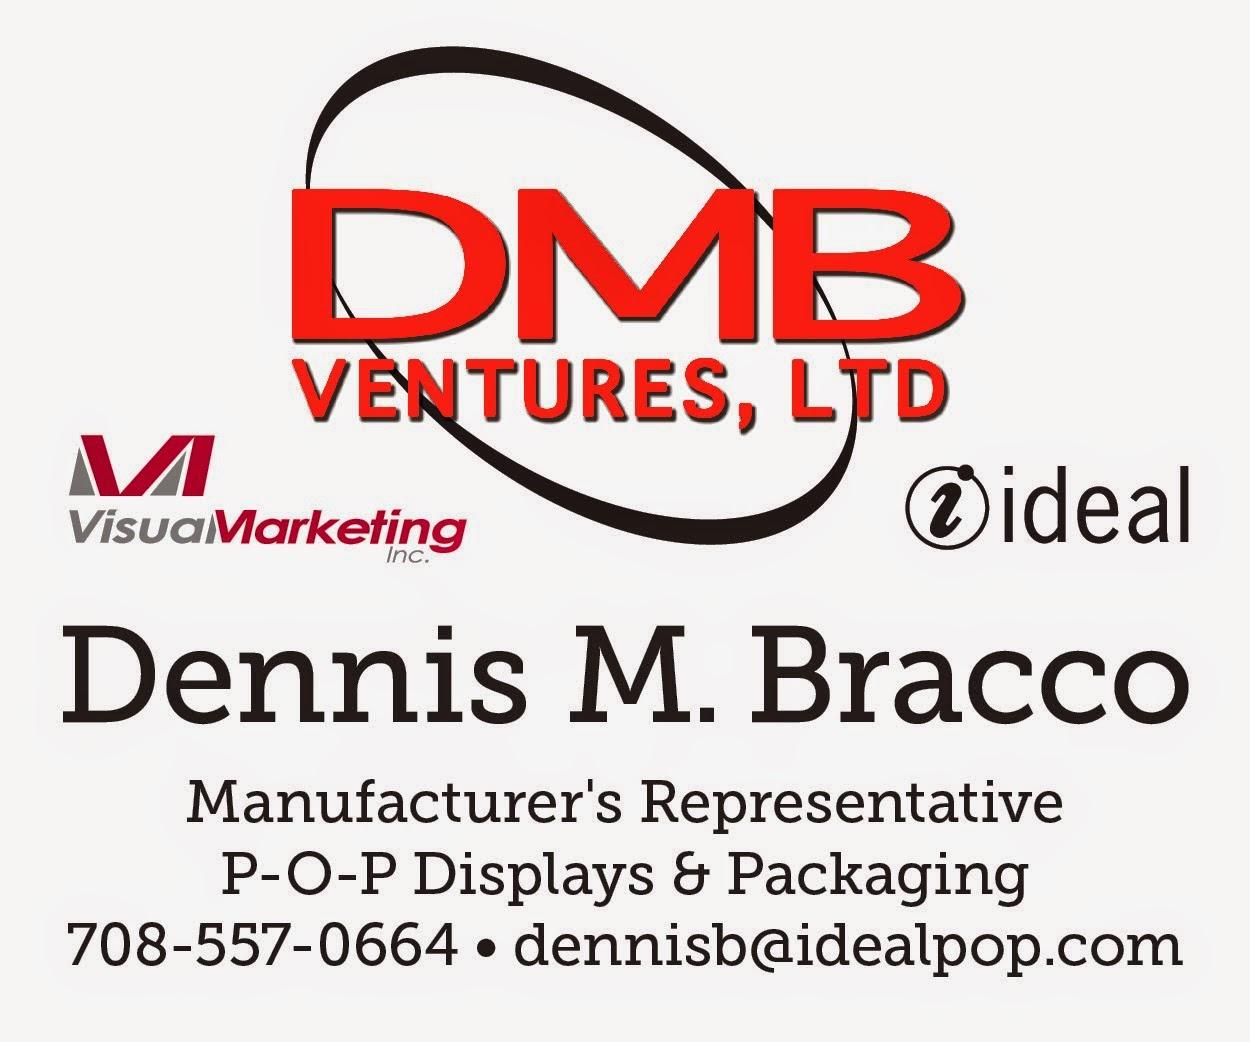 DMB Ventures